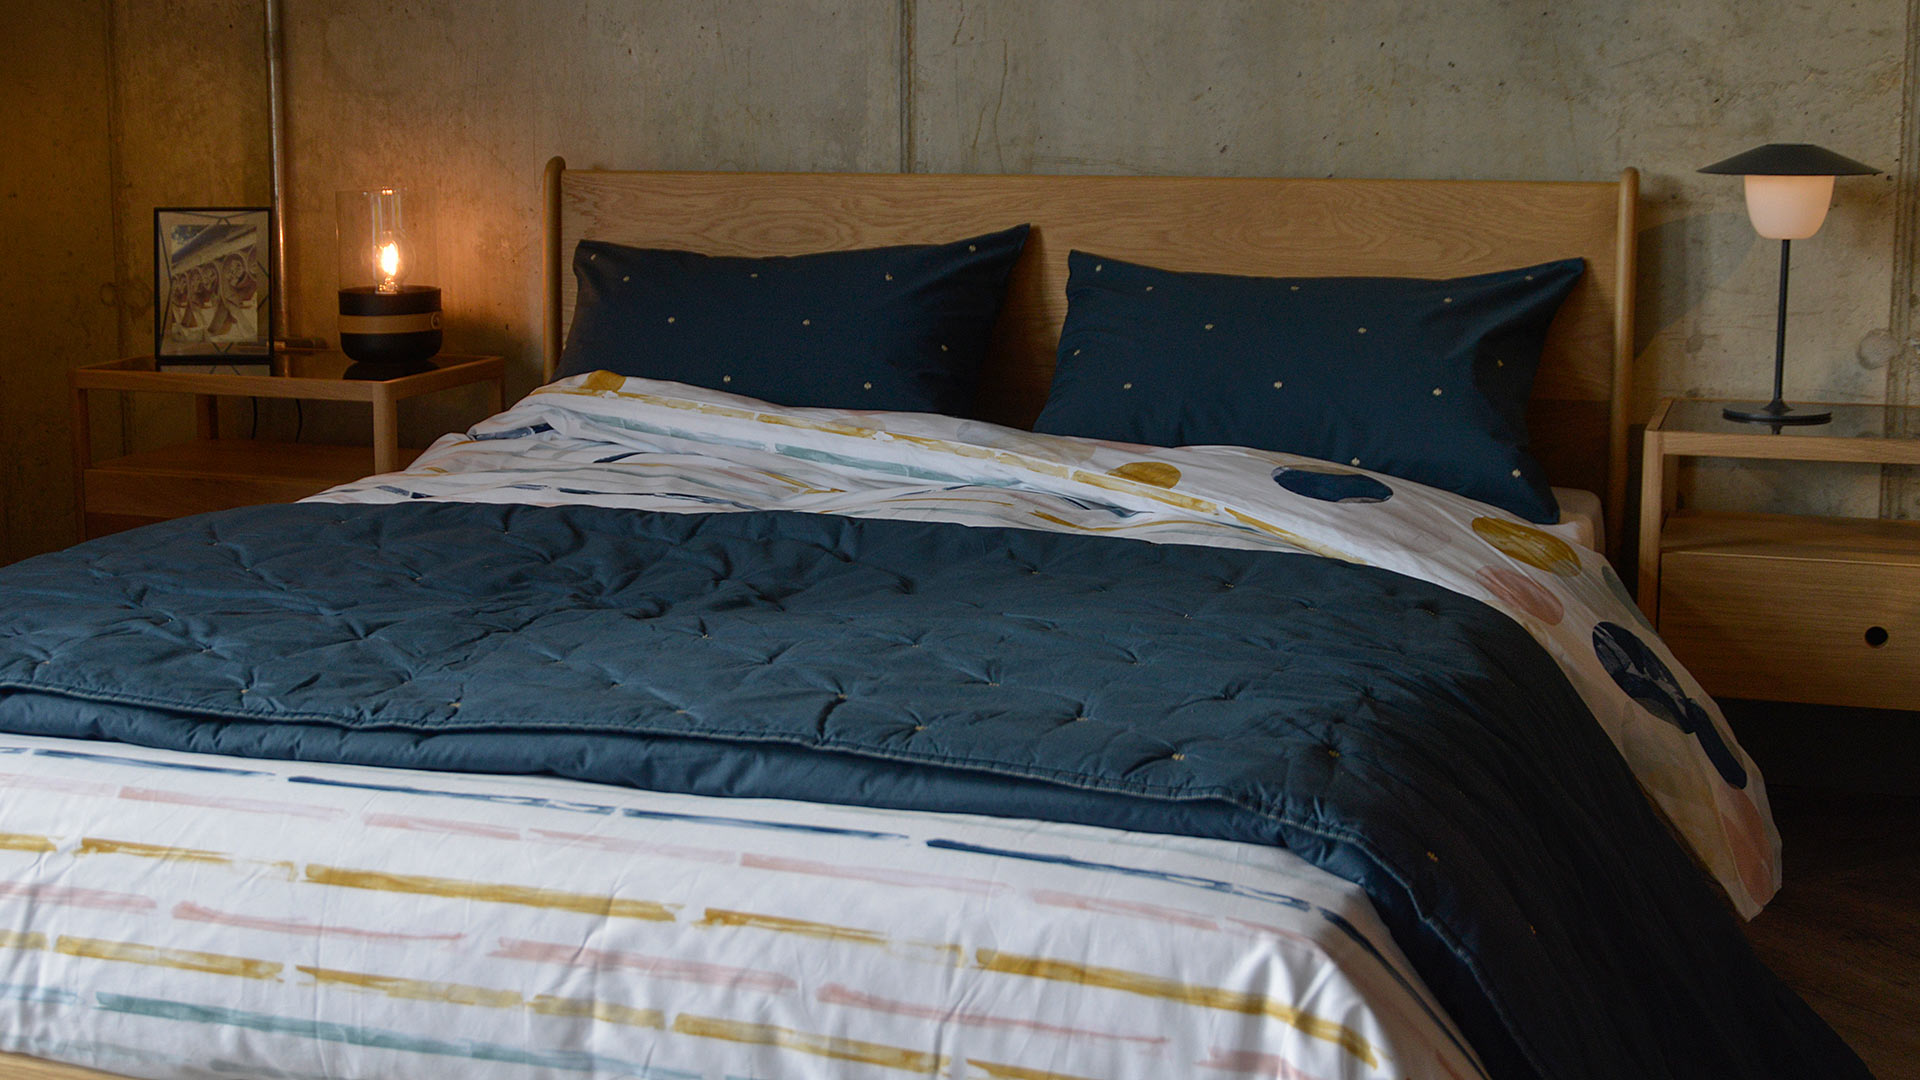 cotton-quilt-in-marine-blue-with-watercolour-stripes-duvet-set